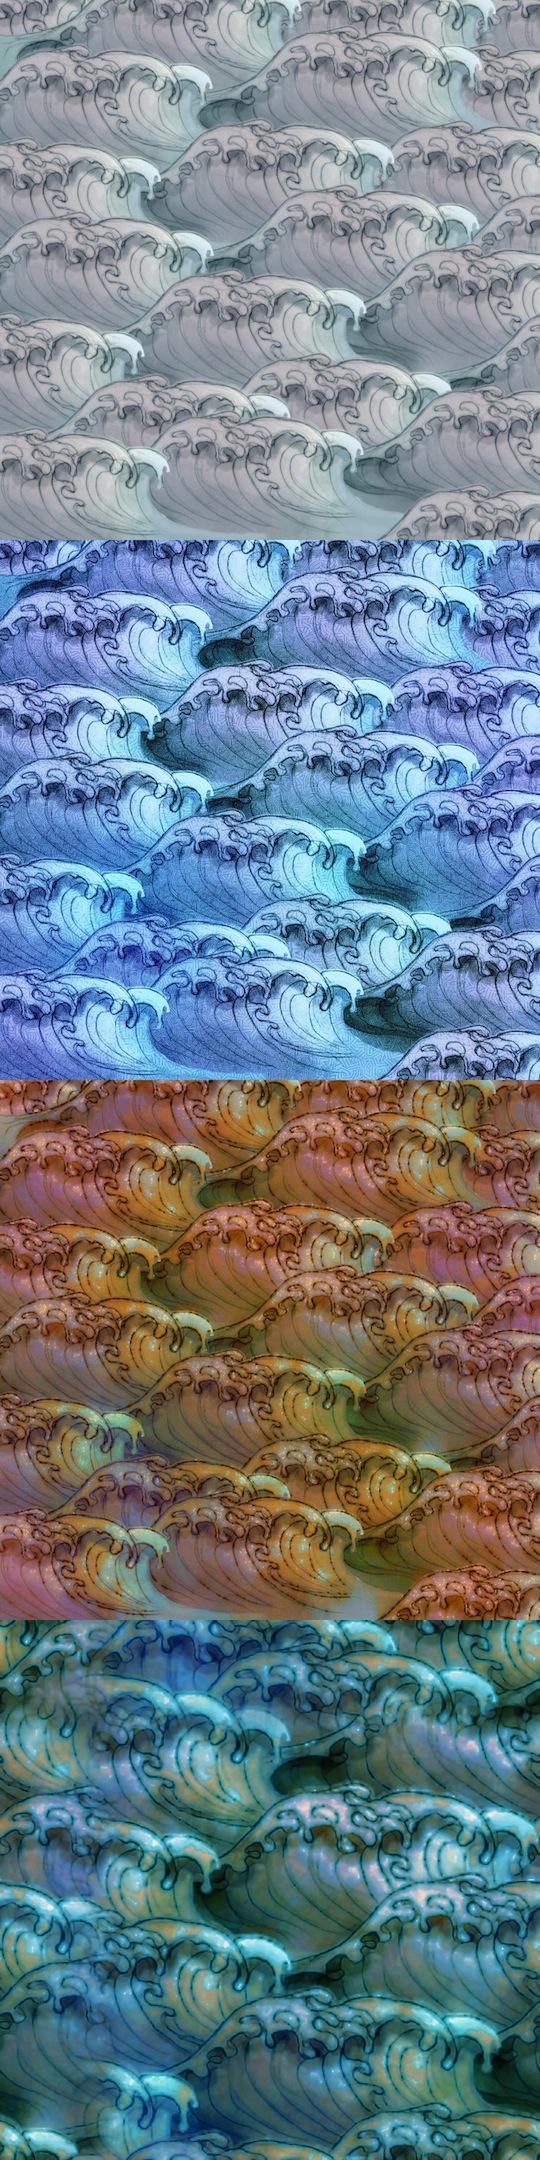 Waves8b_ChrisHoward